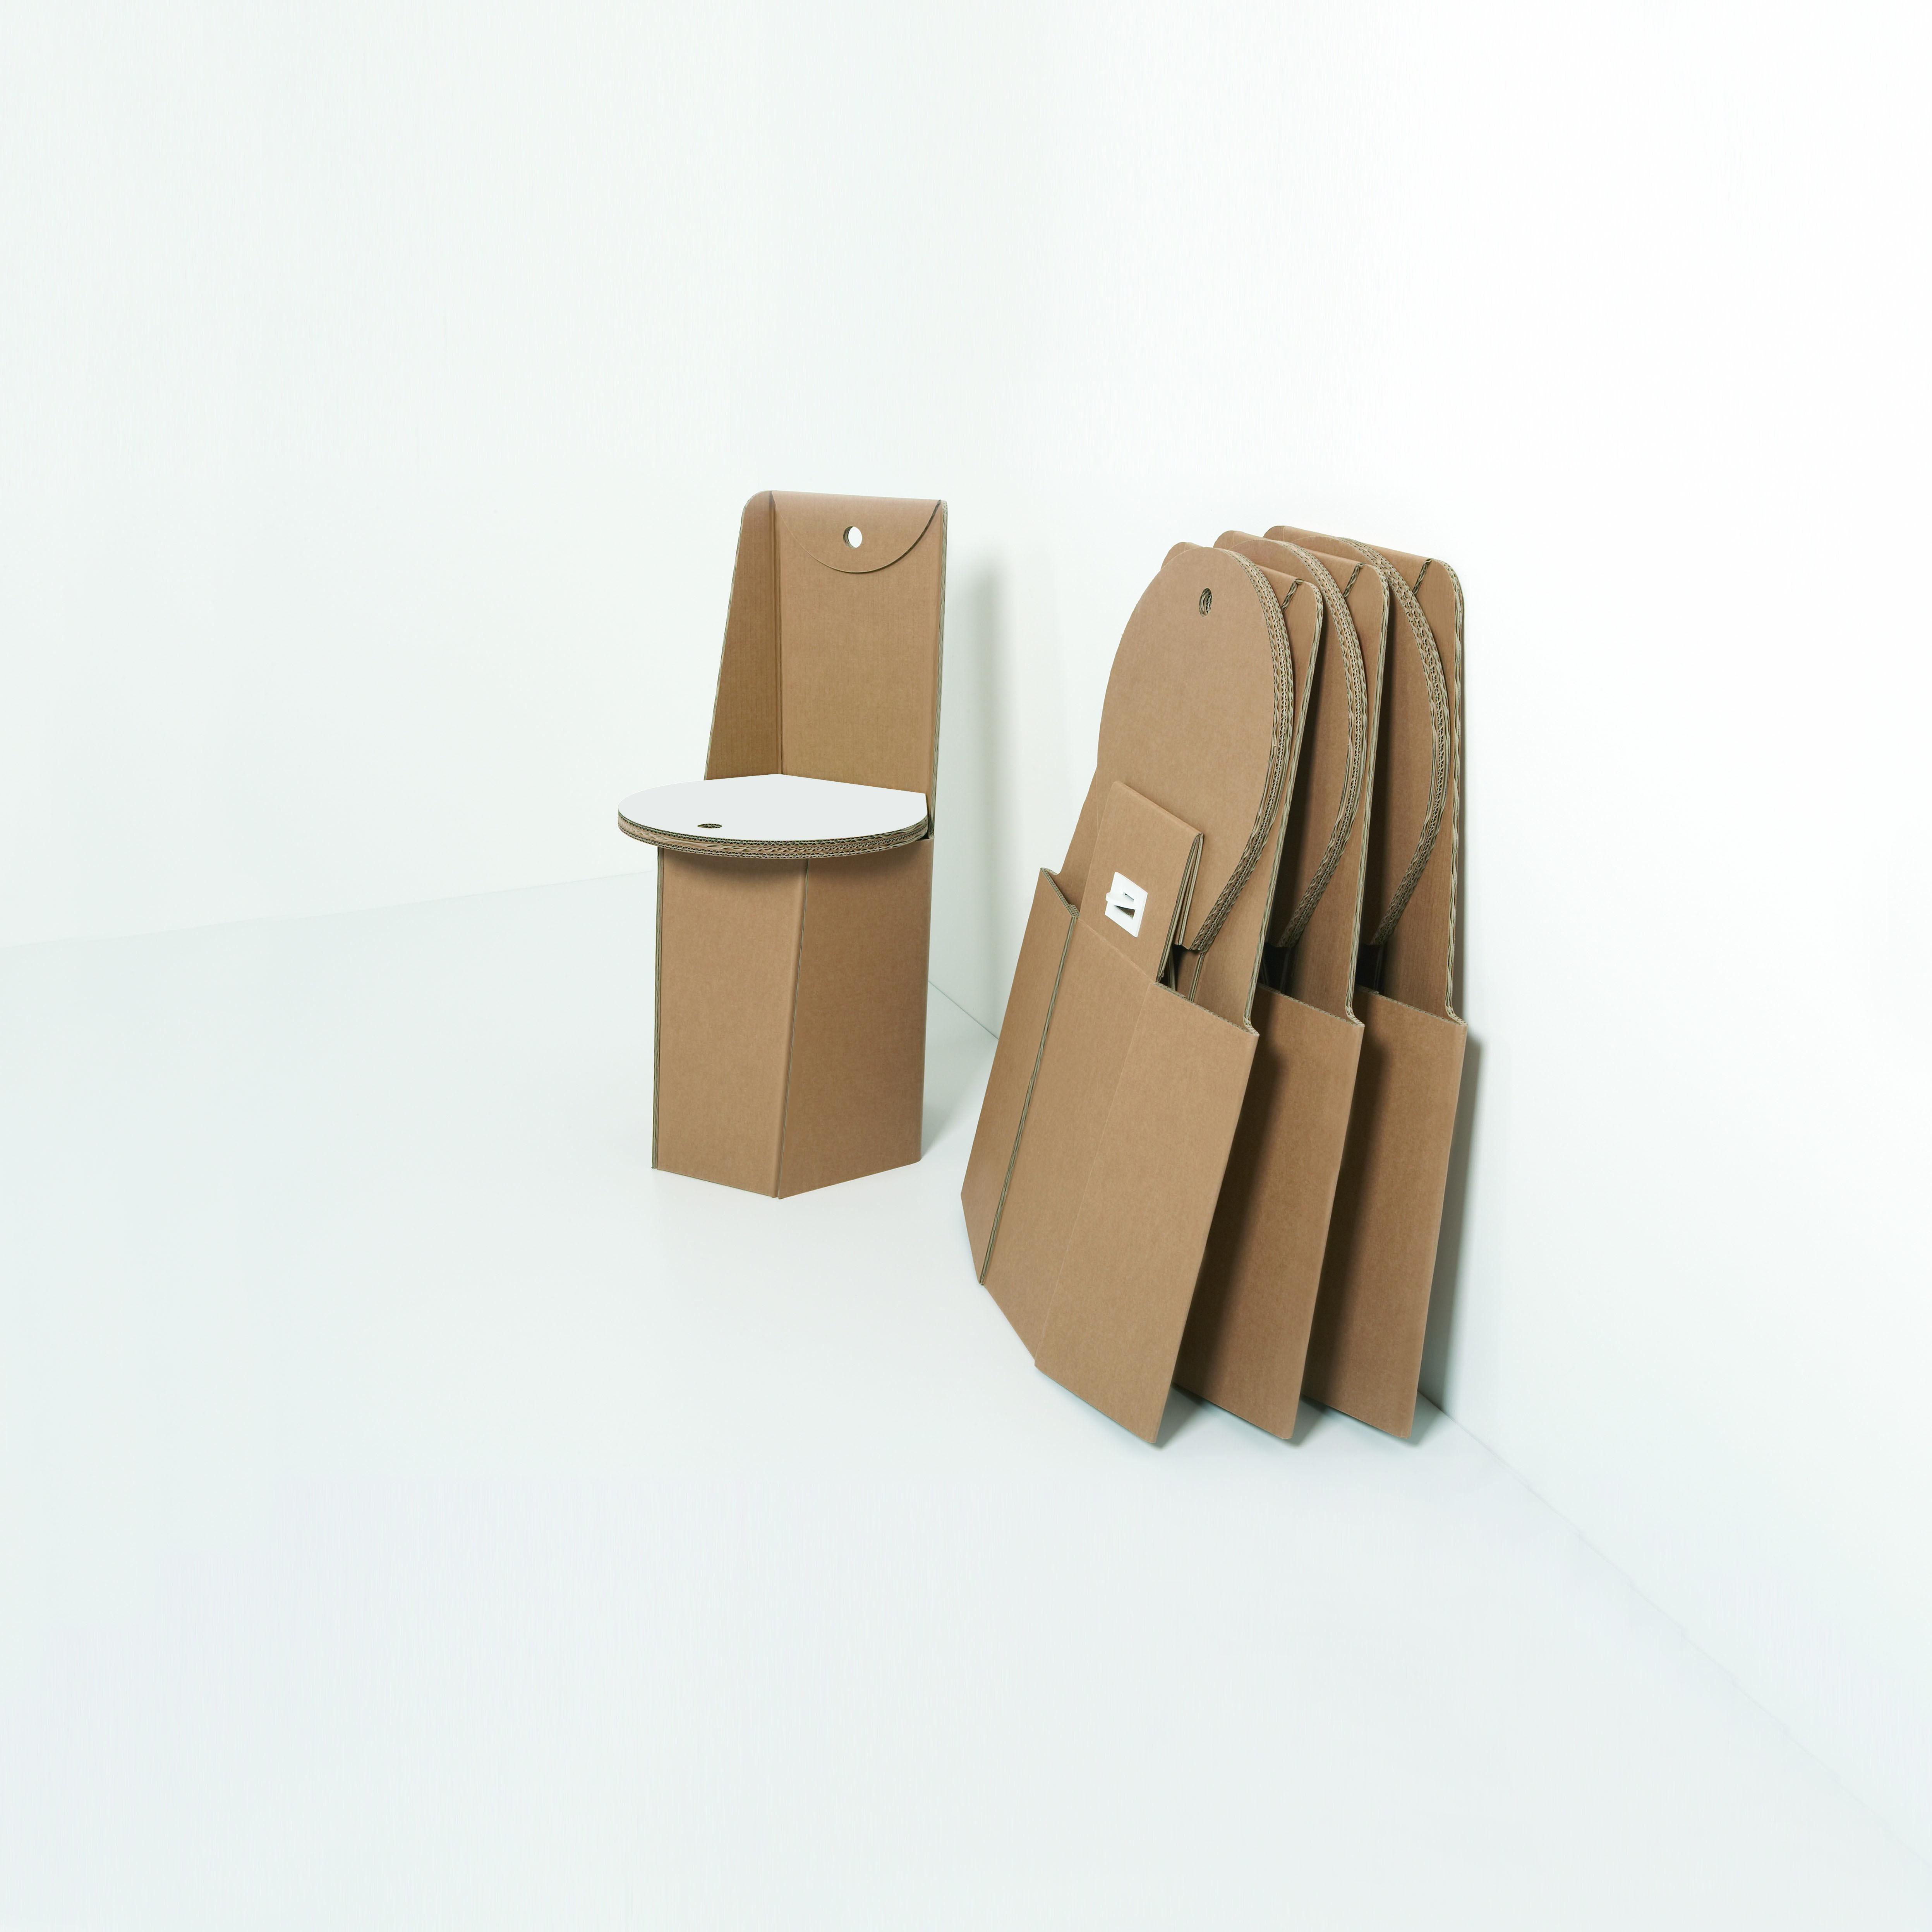 diy cardboard furniture. Cardboard Chair, Design, Diy Cardboard, Furniture, Folding Chairs, Chair Wood, Catalog, Cartonnage Furniture O